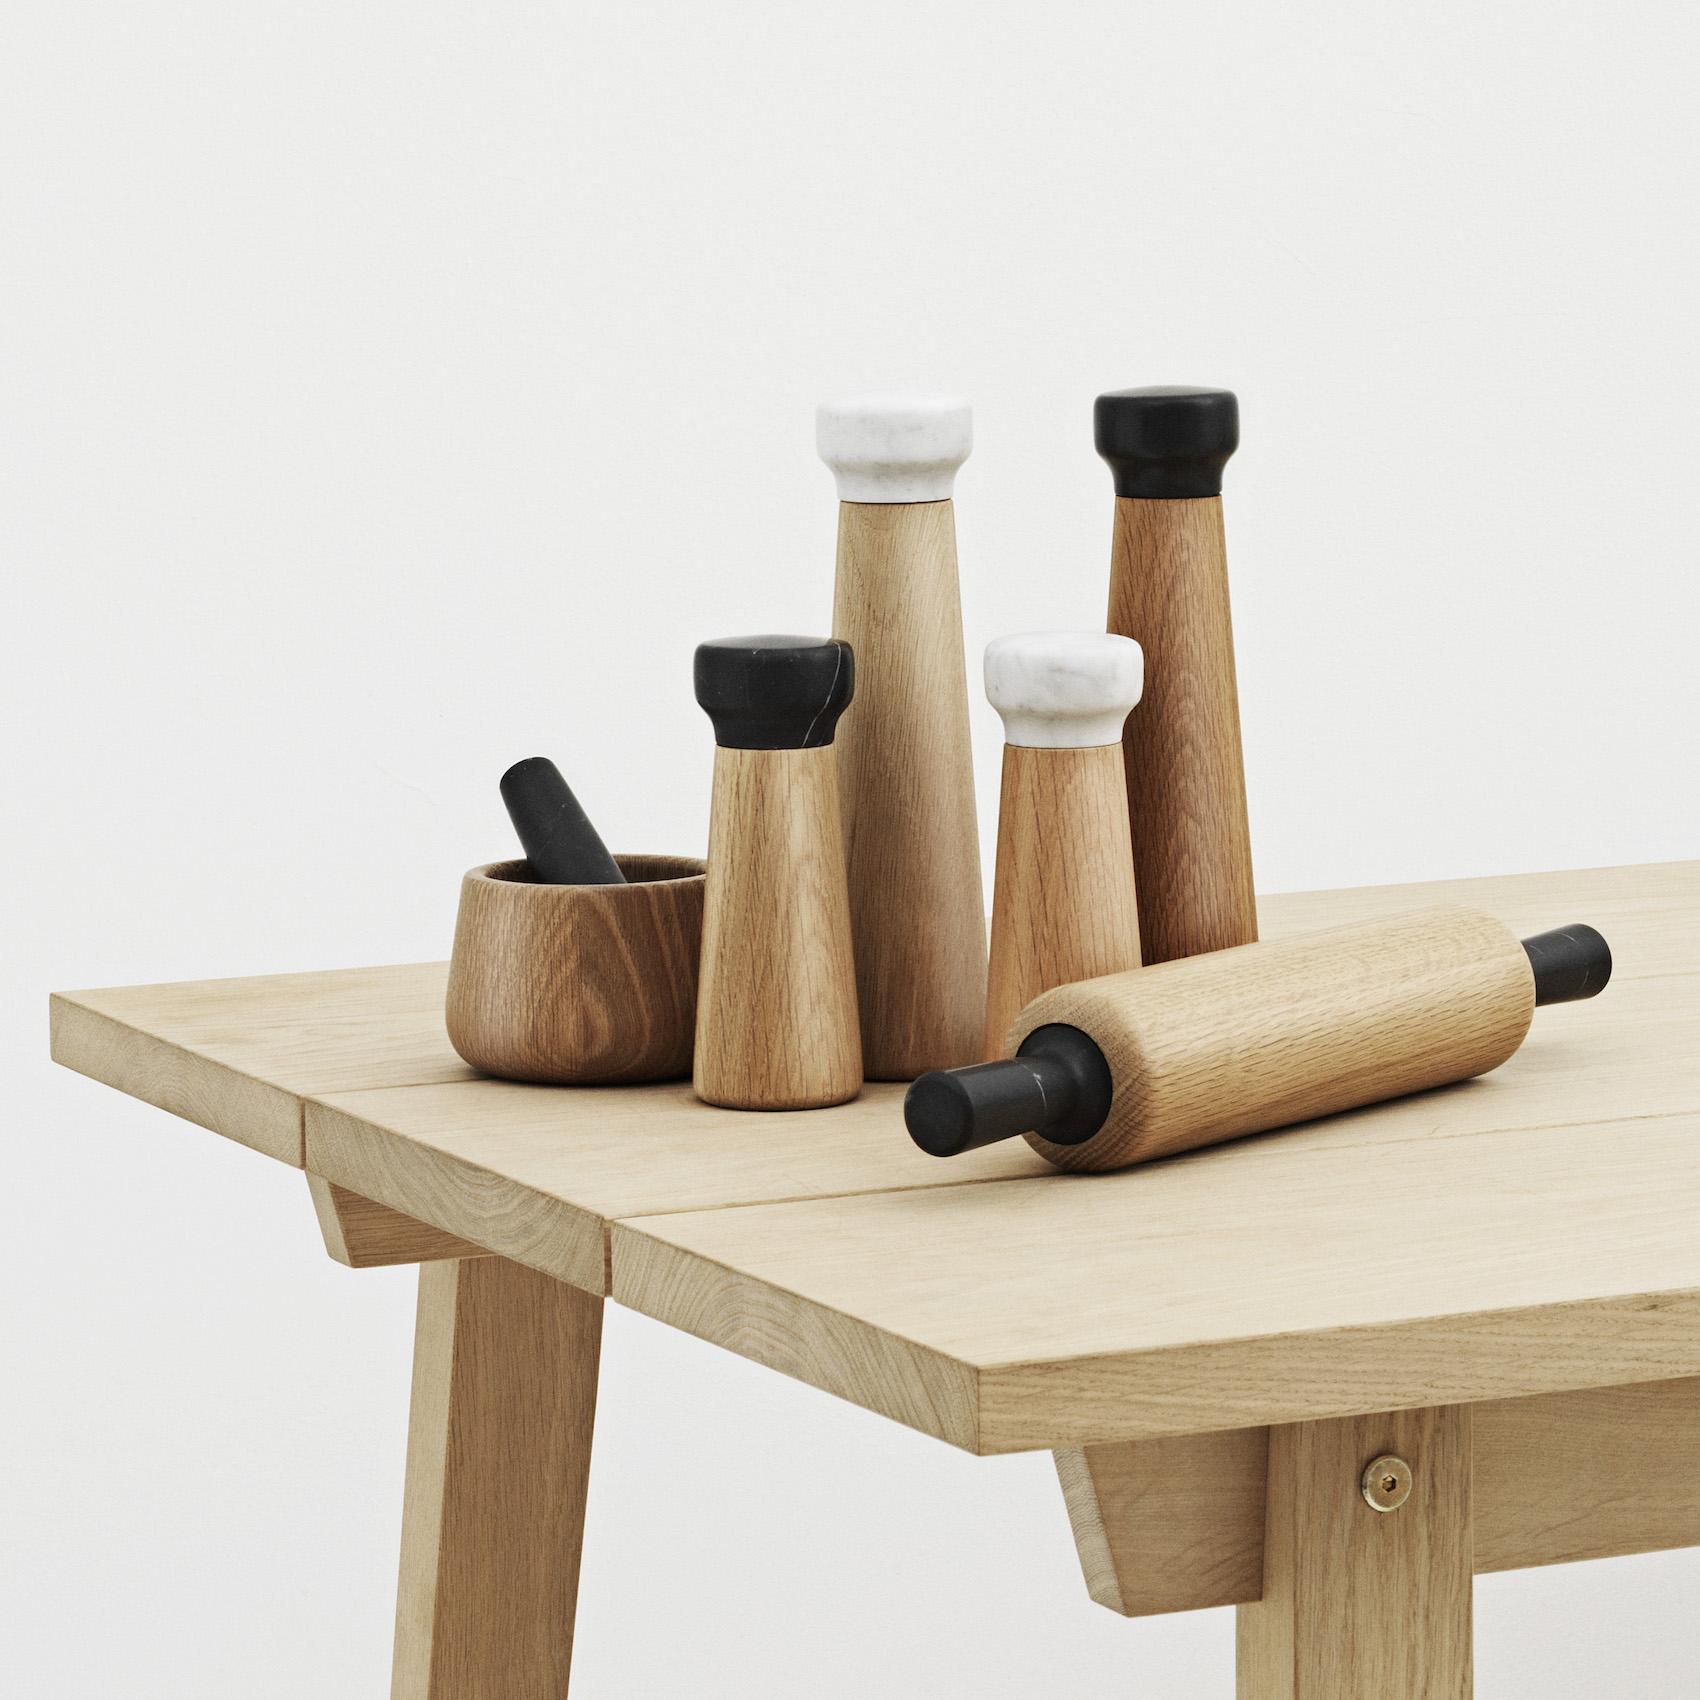 Normann Copenhagen – Craft kitchen accessories – Simon Legald